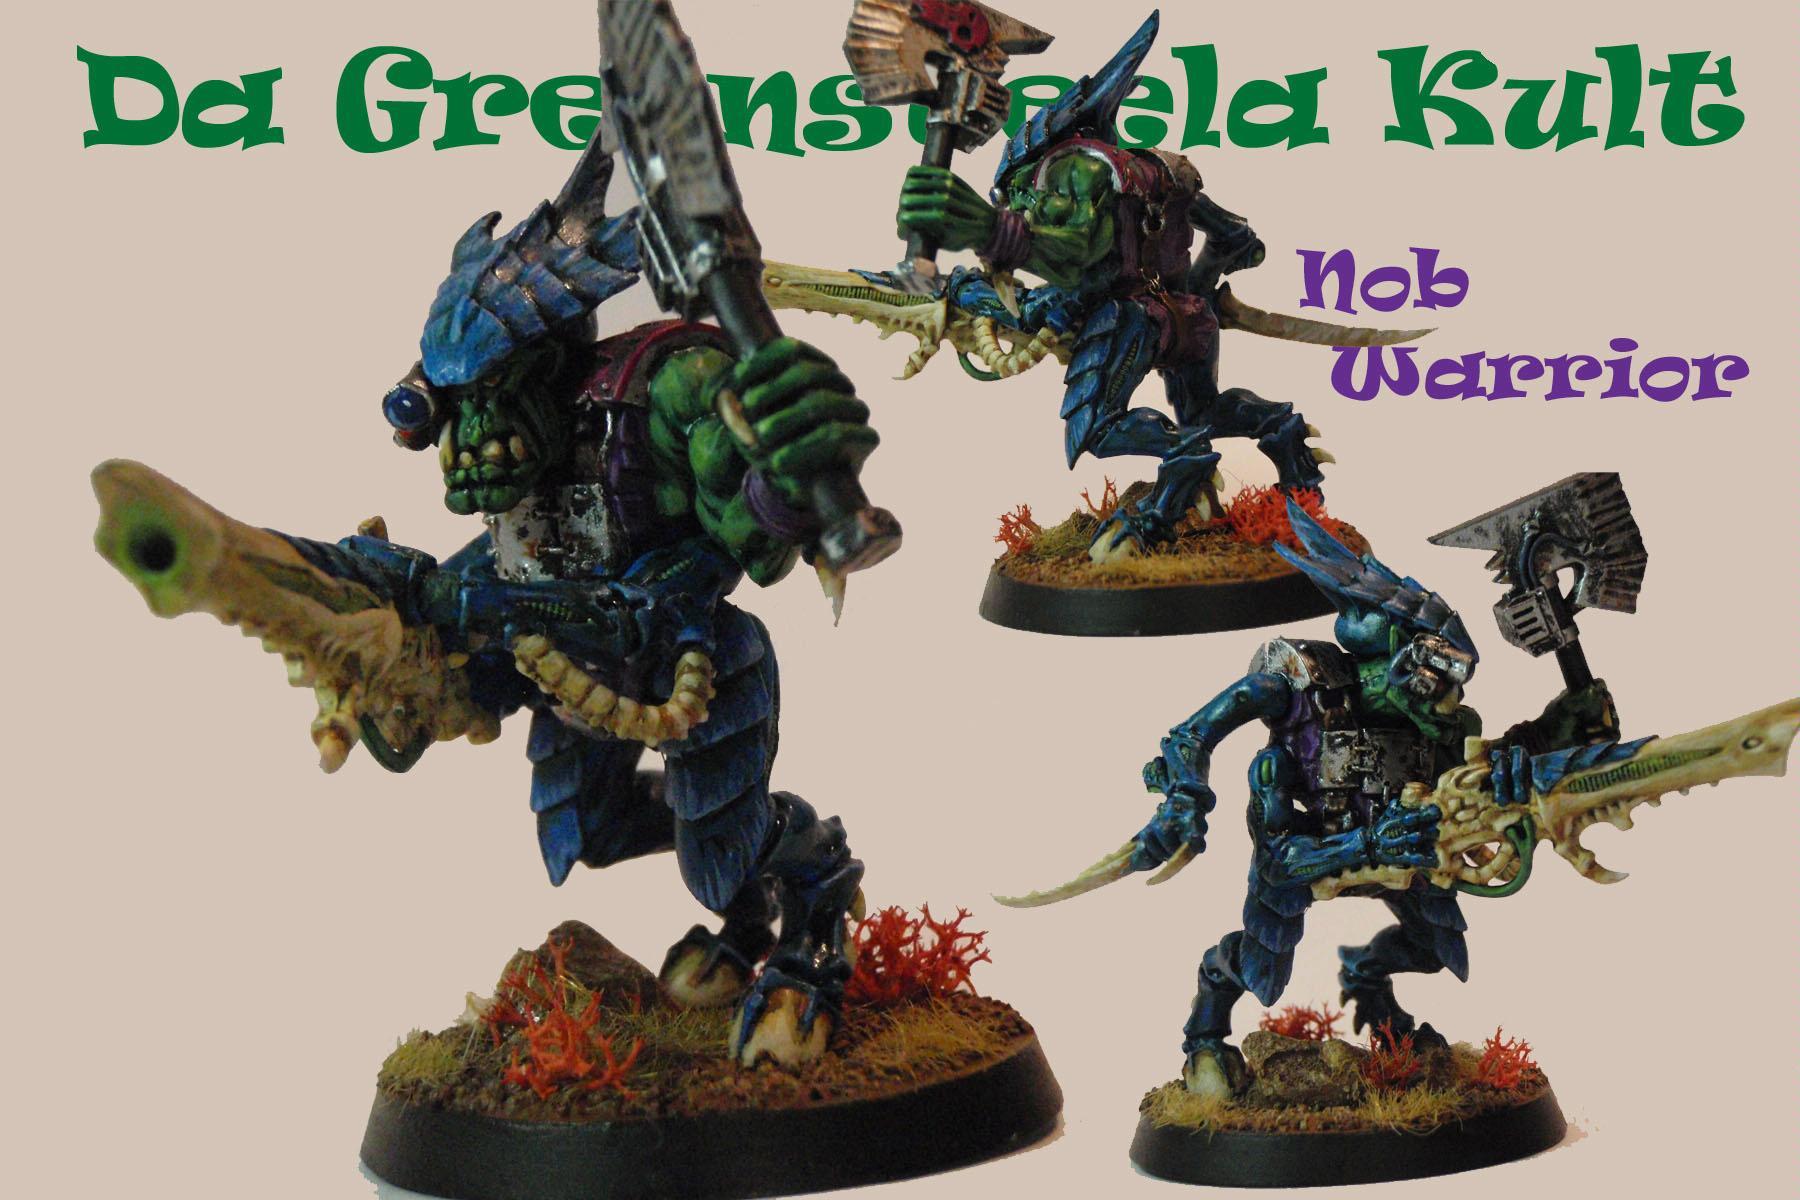 Genestealer Cult, Greensteela, Nob, Orks, Tyranid Warriors